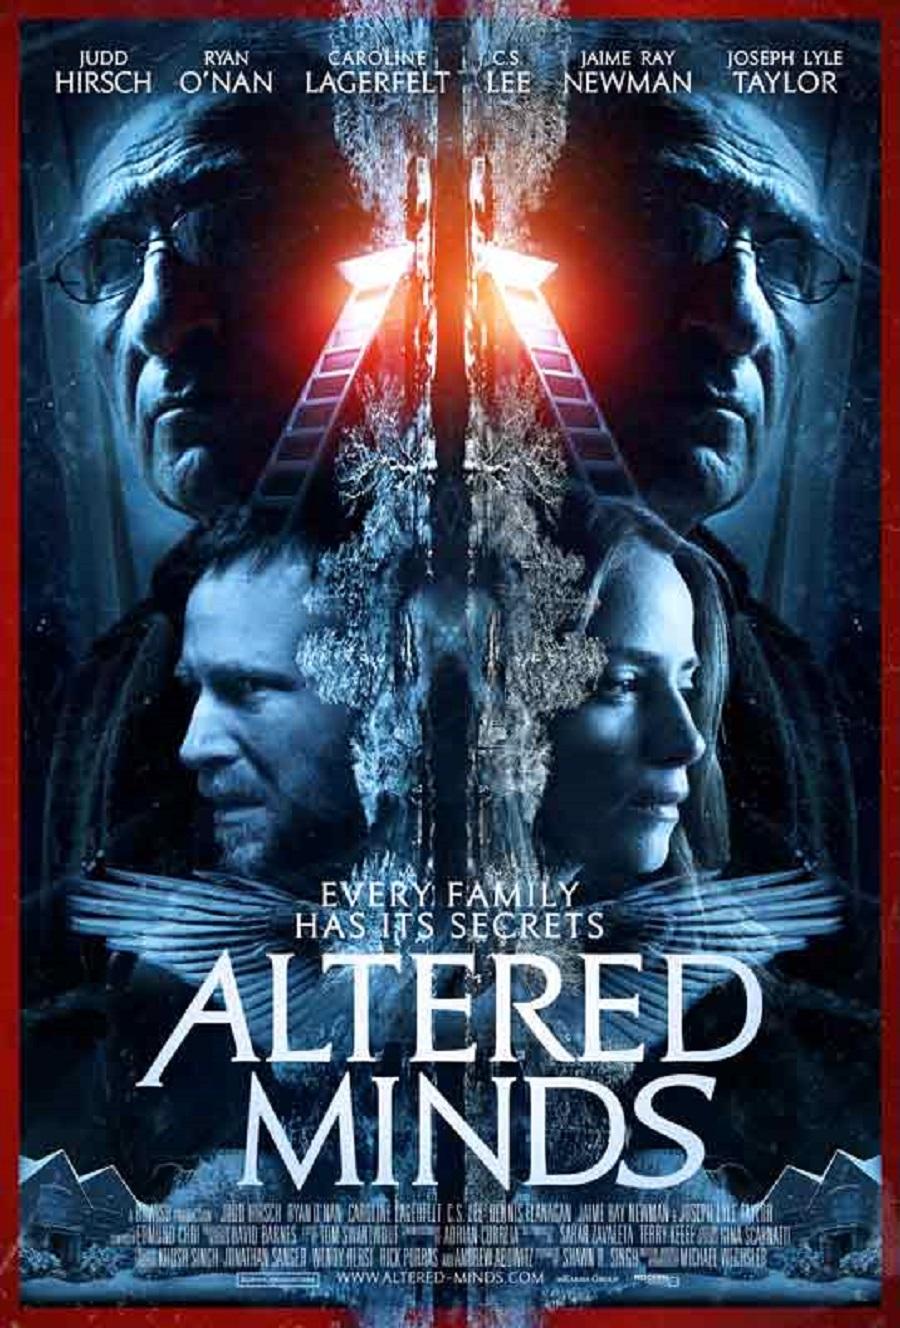 altered-minds-poster